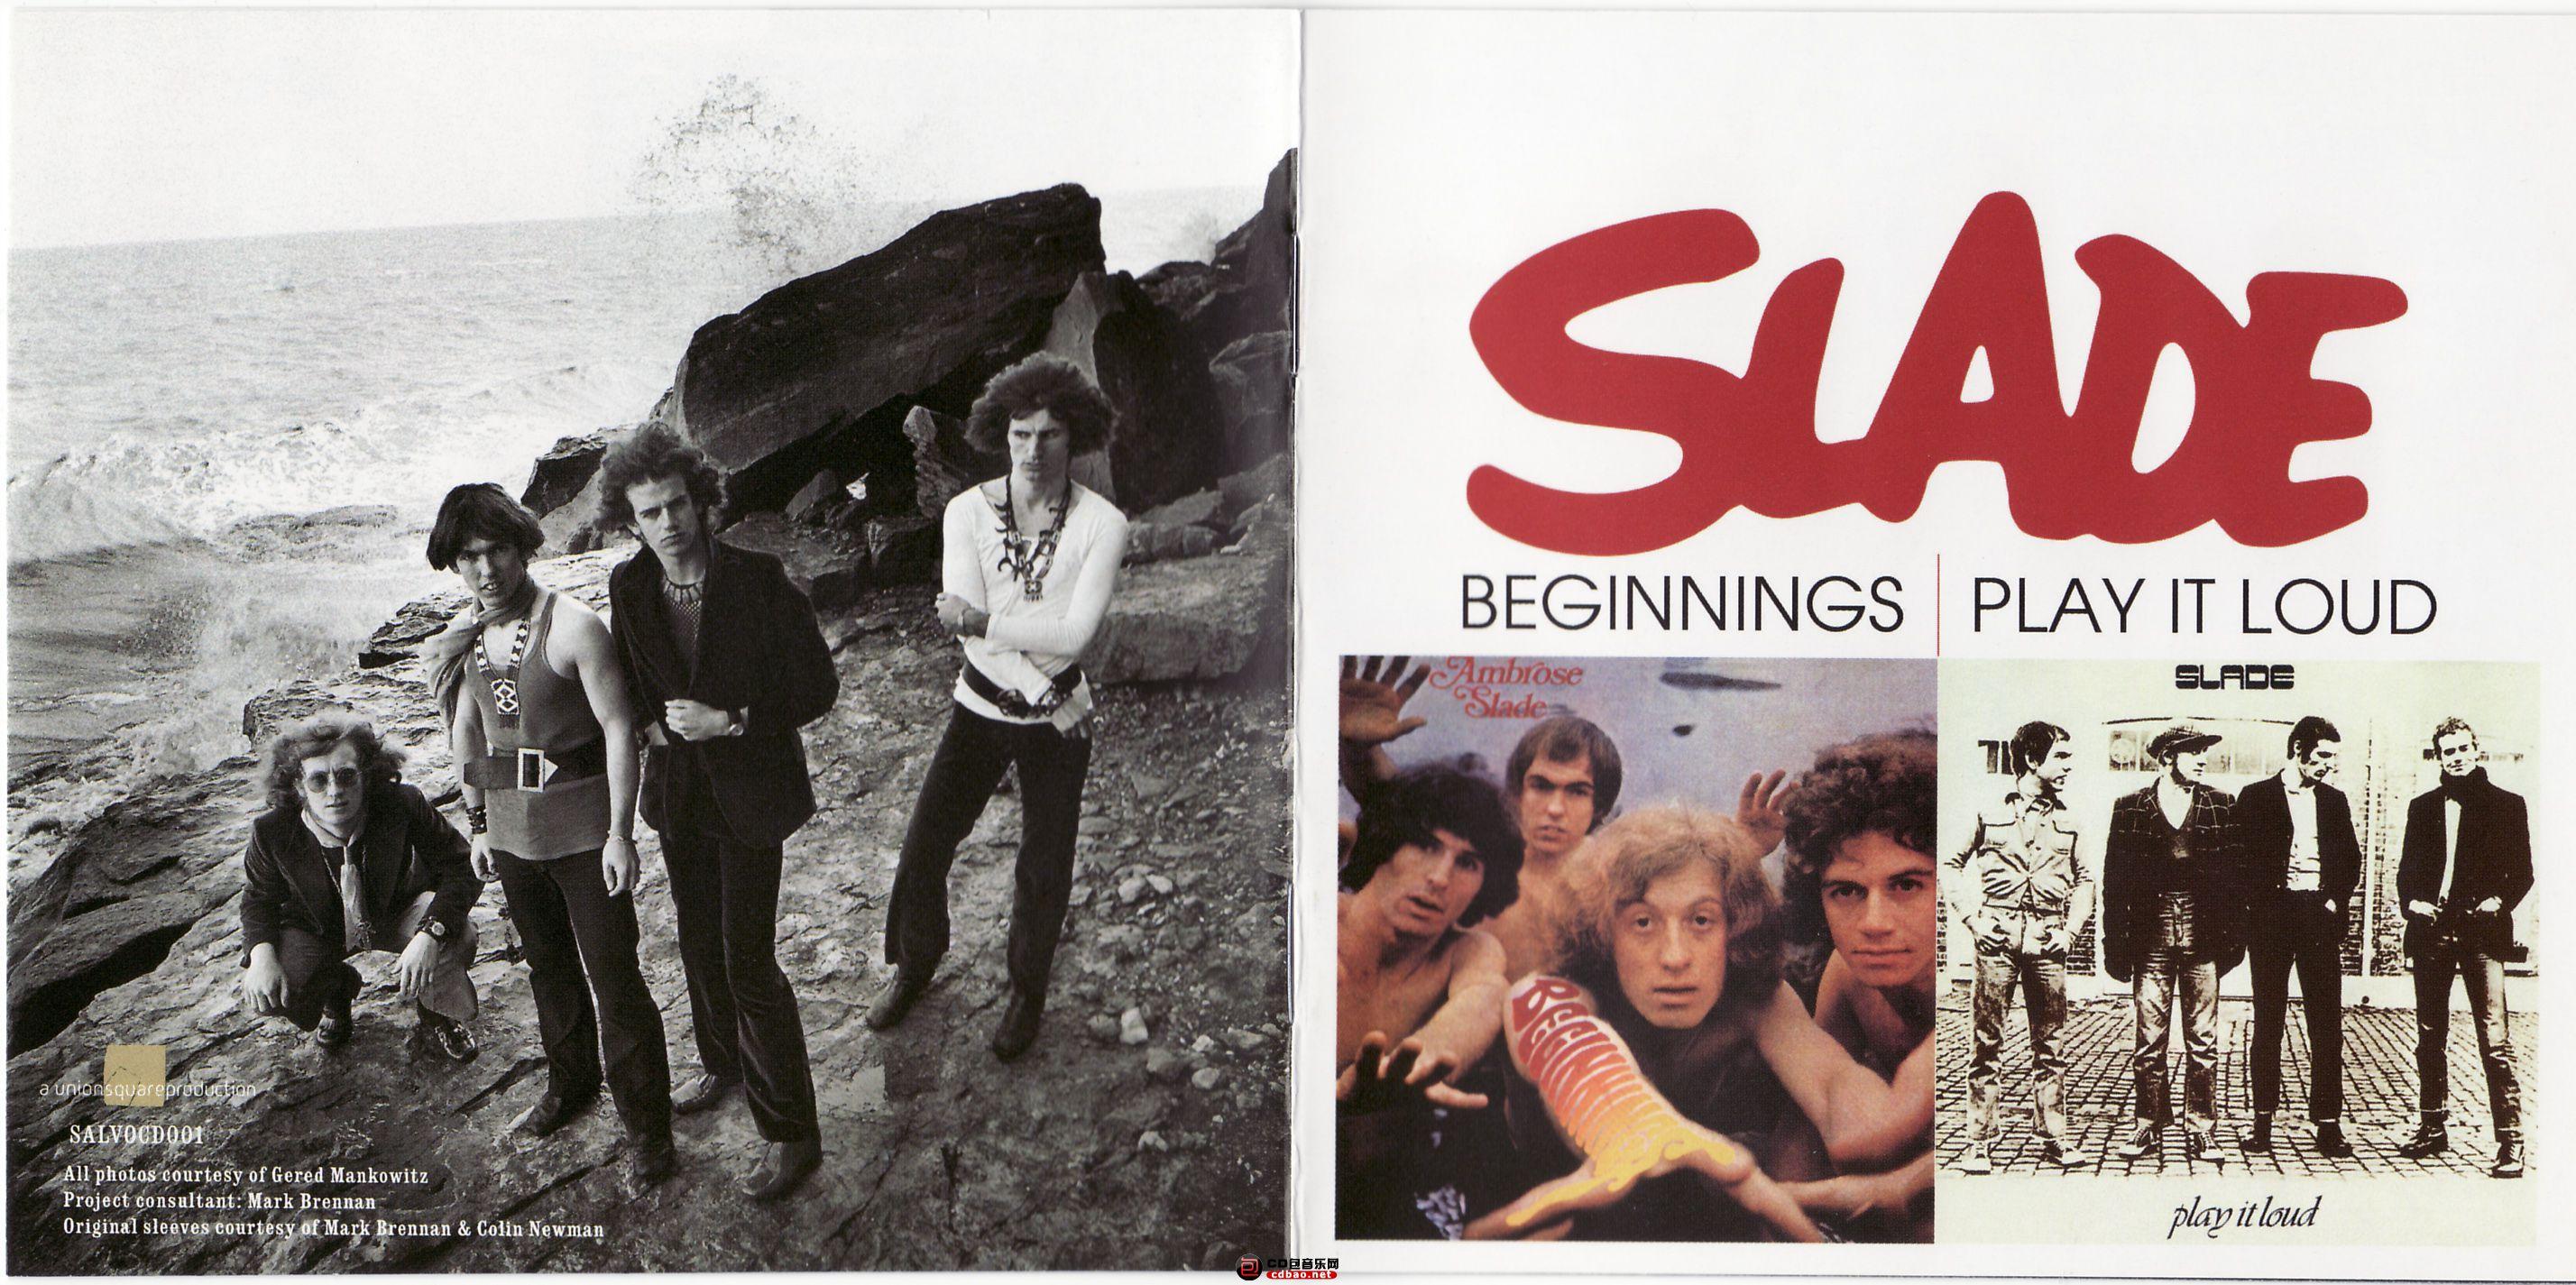 Slade-69-01.jpg